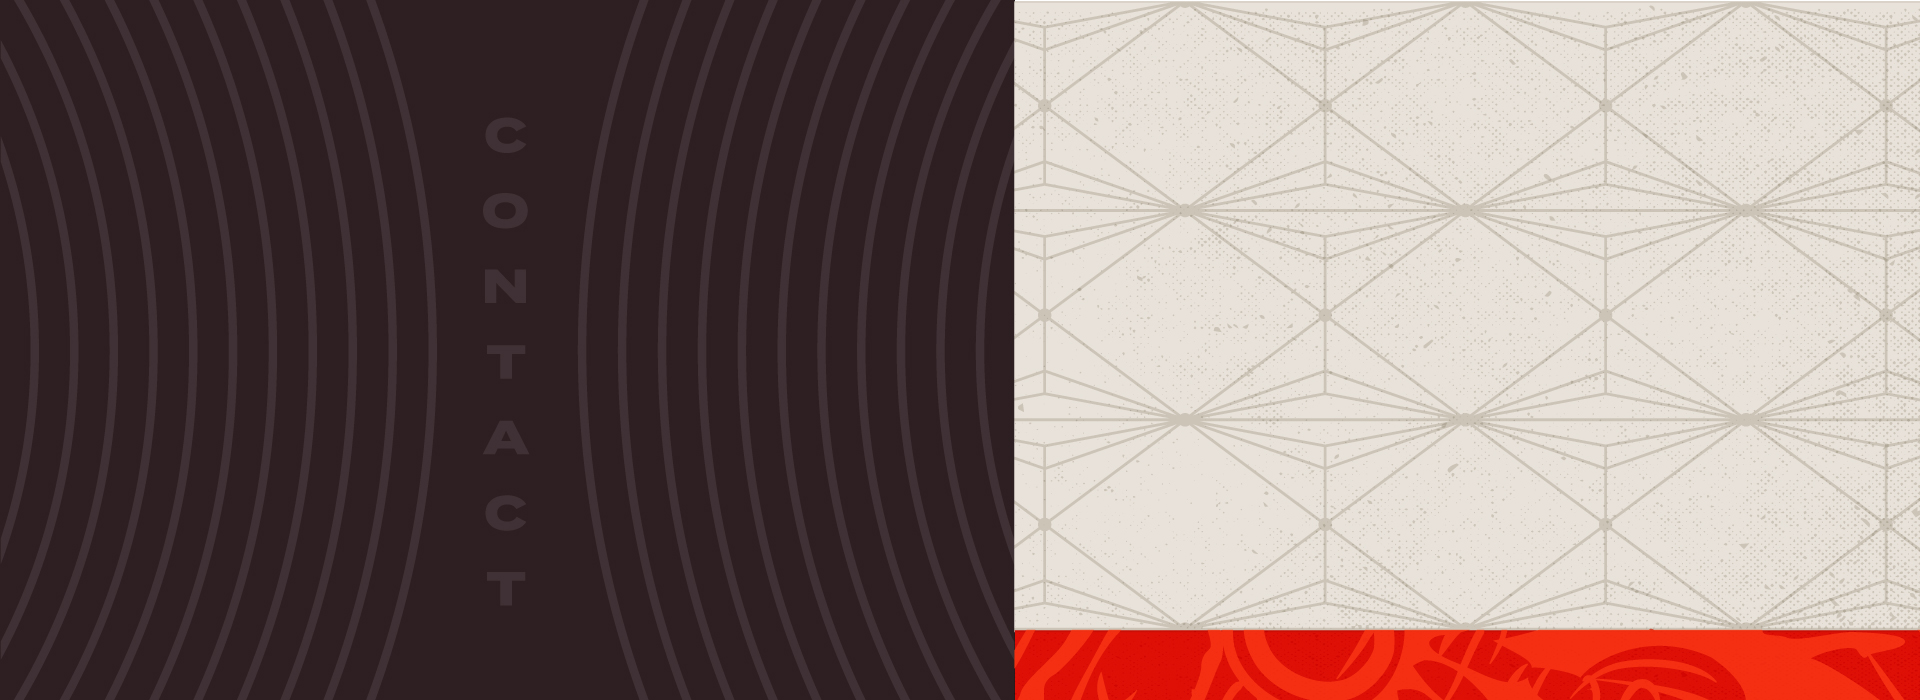 Tiny Giant - Creative Agency / Graphic Design Studio - Contact Us